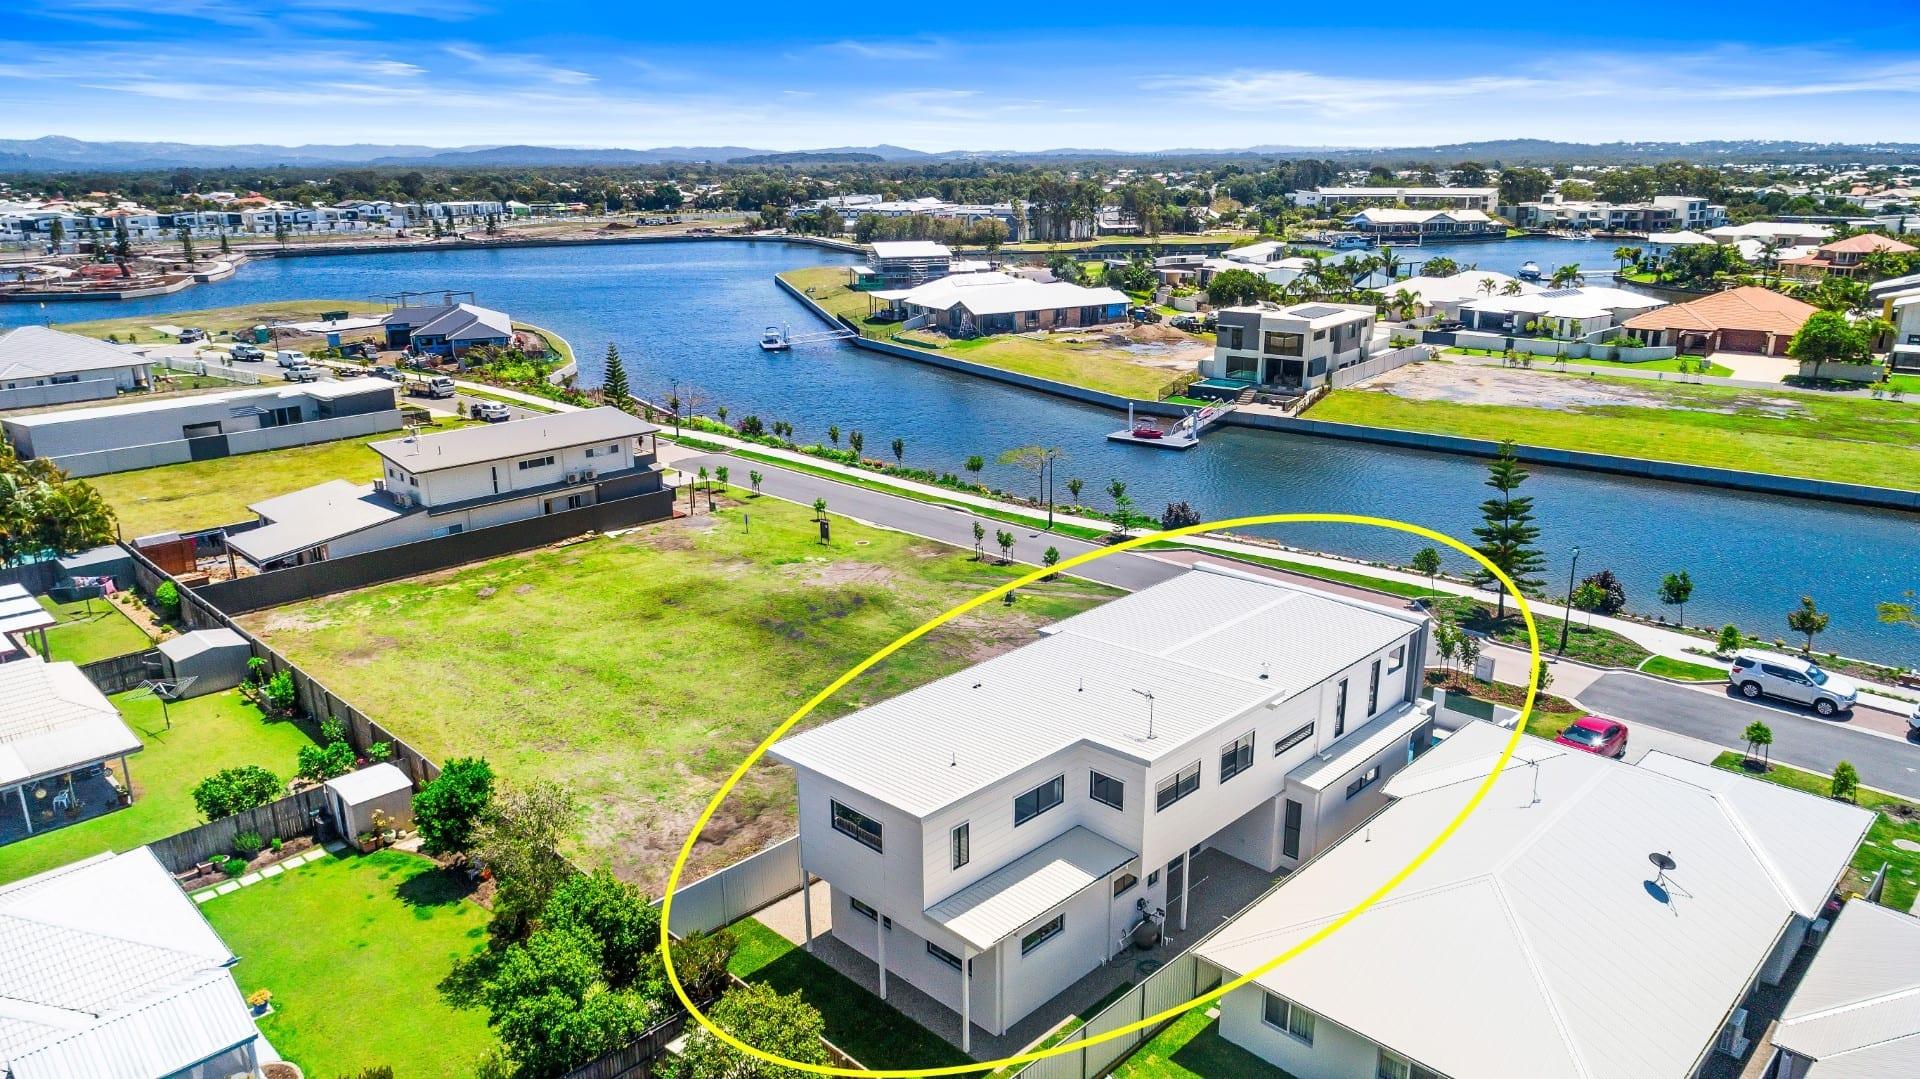 39 Marina View Drive Pelican Waters Qld 4551 Australia